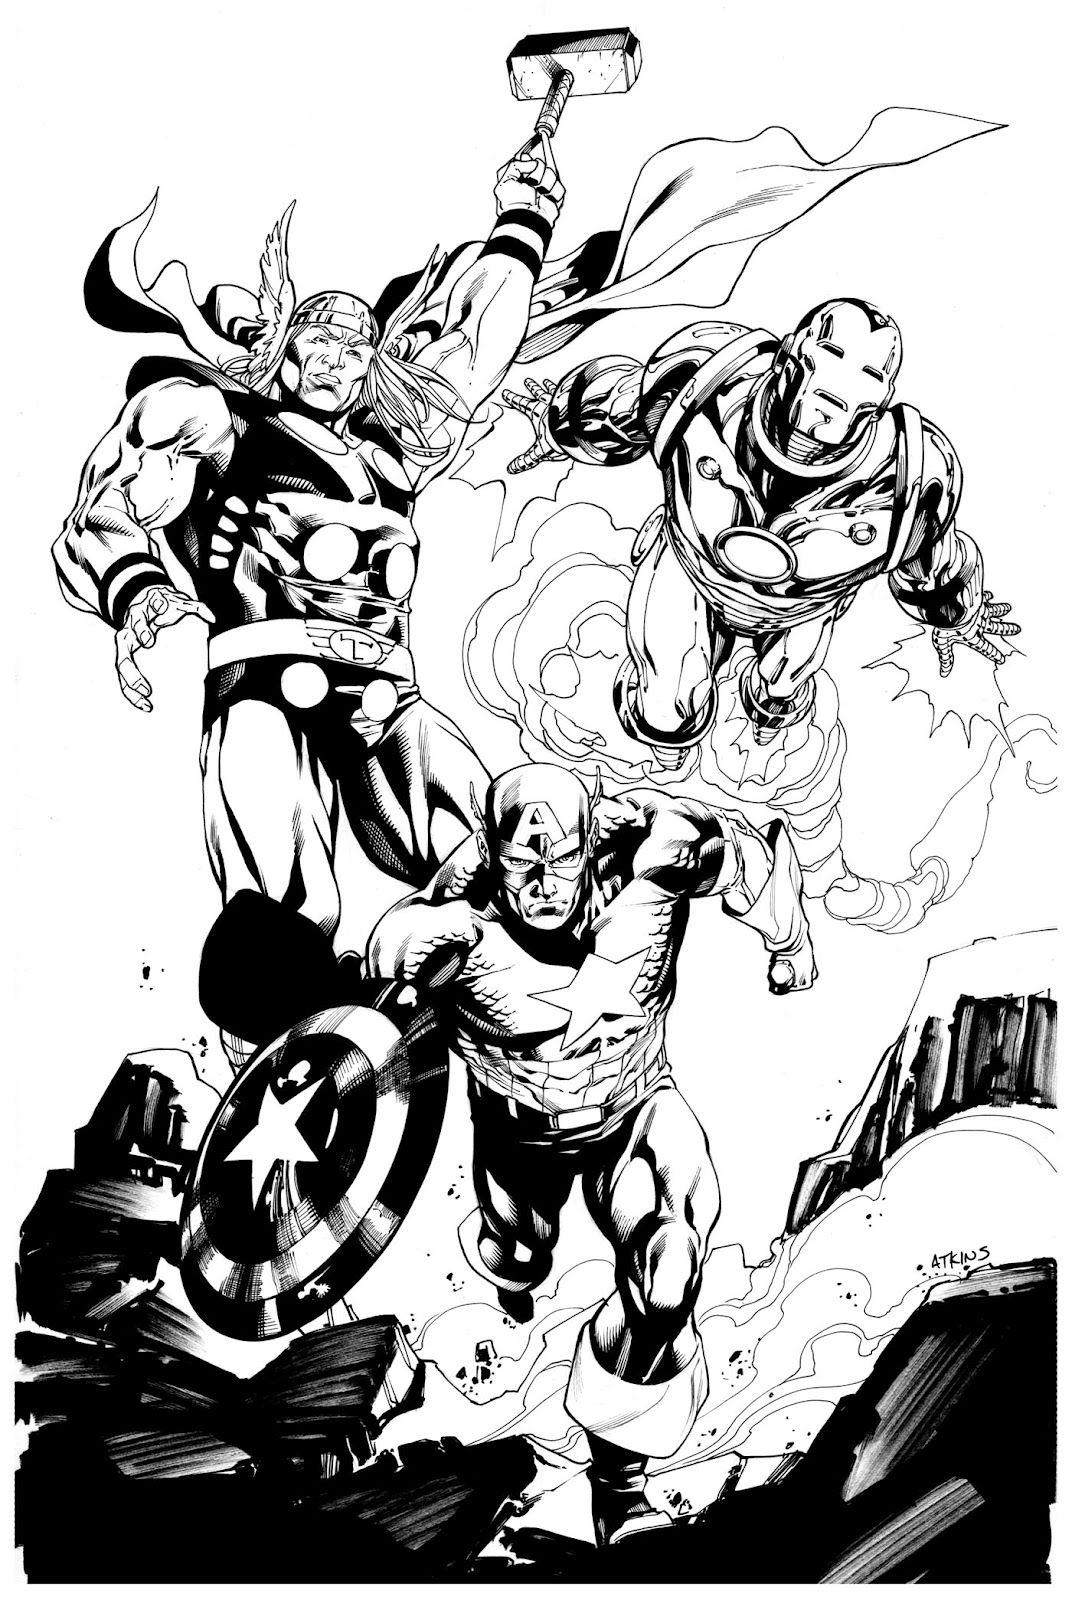 Thor, Iron Man & Captain America by Robert Atkins